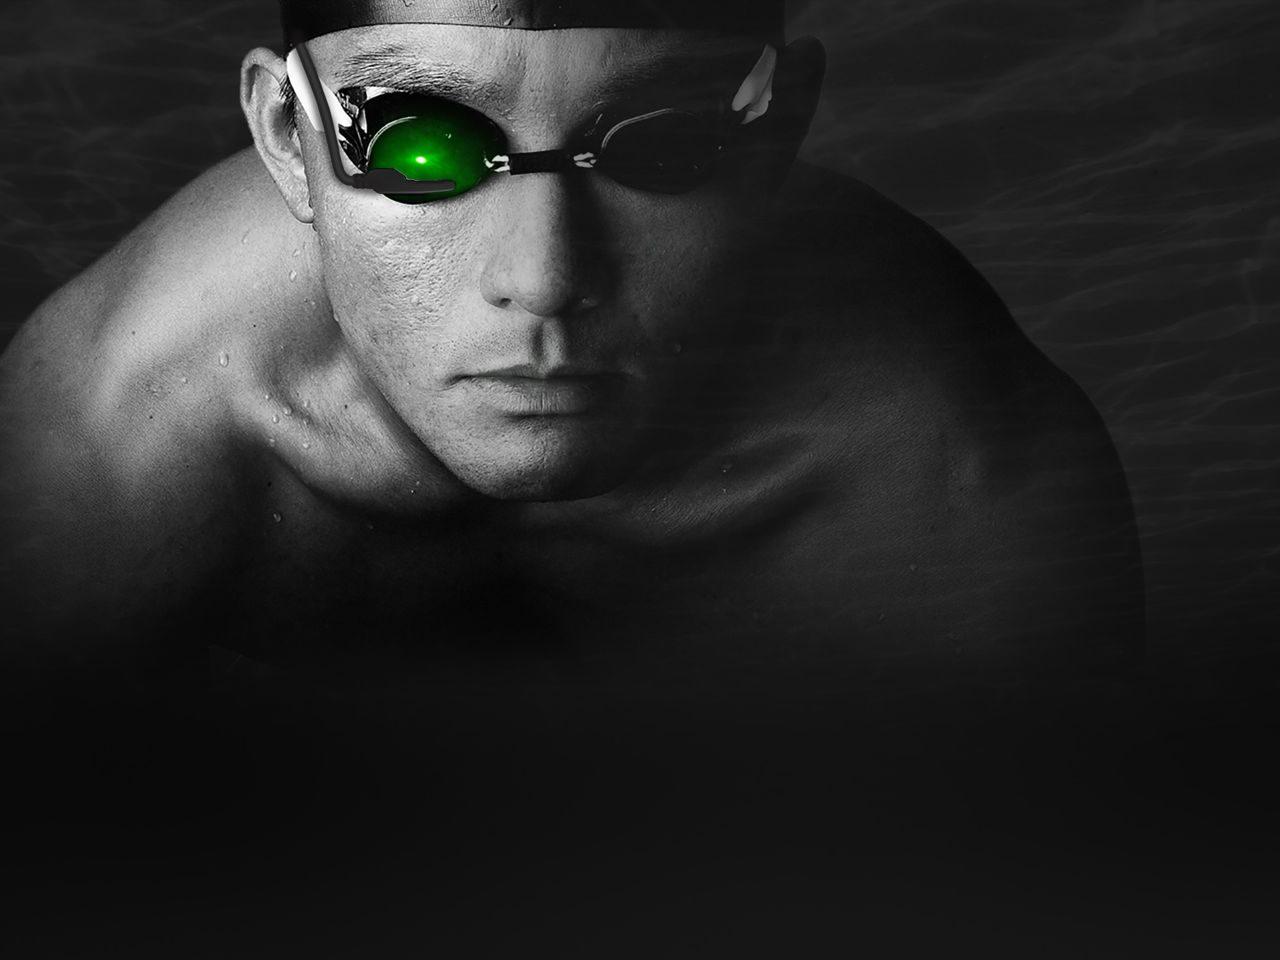 IOLITE swimming aid